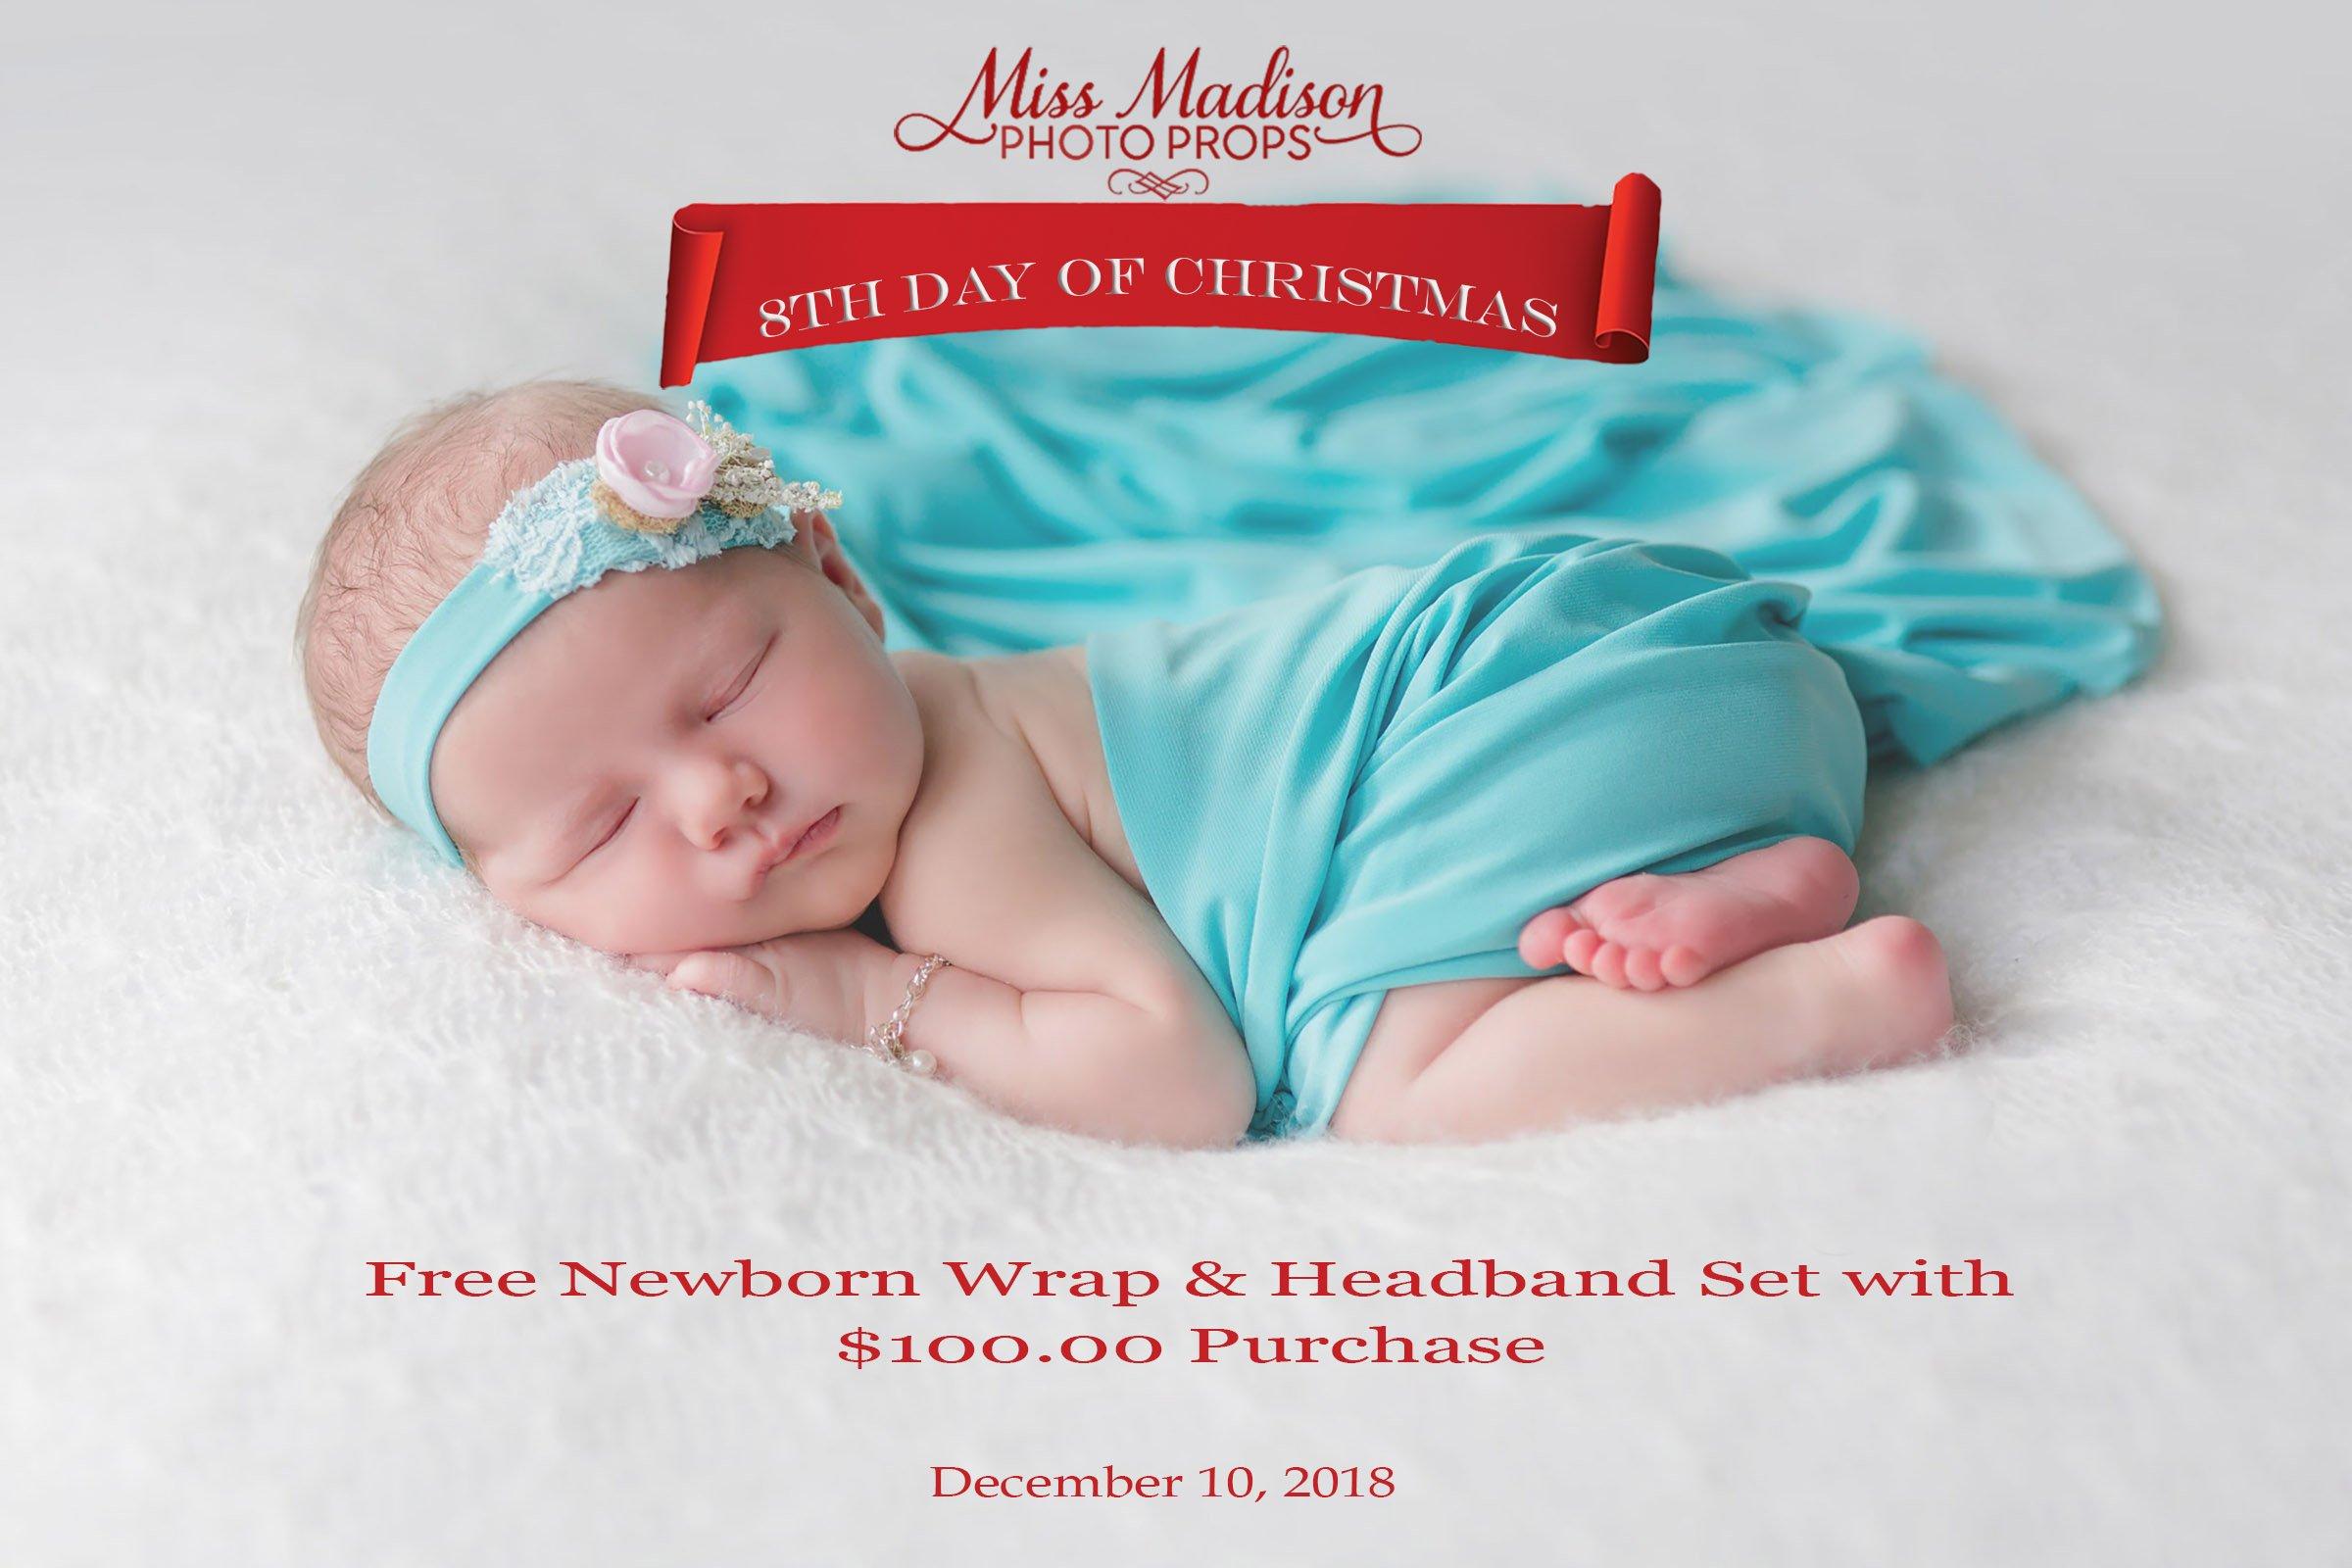 newborn wrap and headband, maternity gown photography, maternity dress photo shoot, newborn photography prop